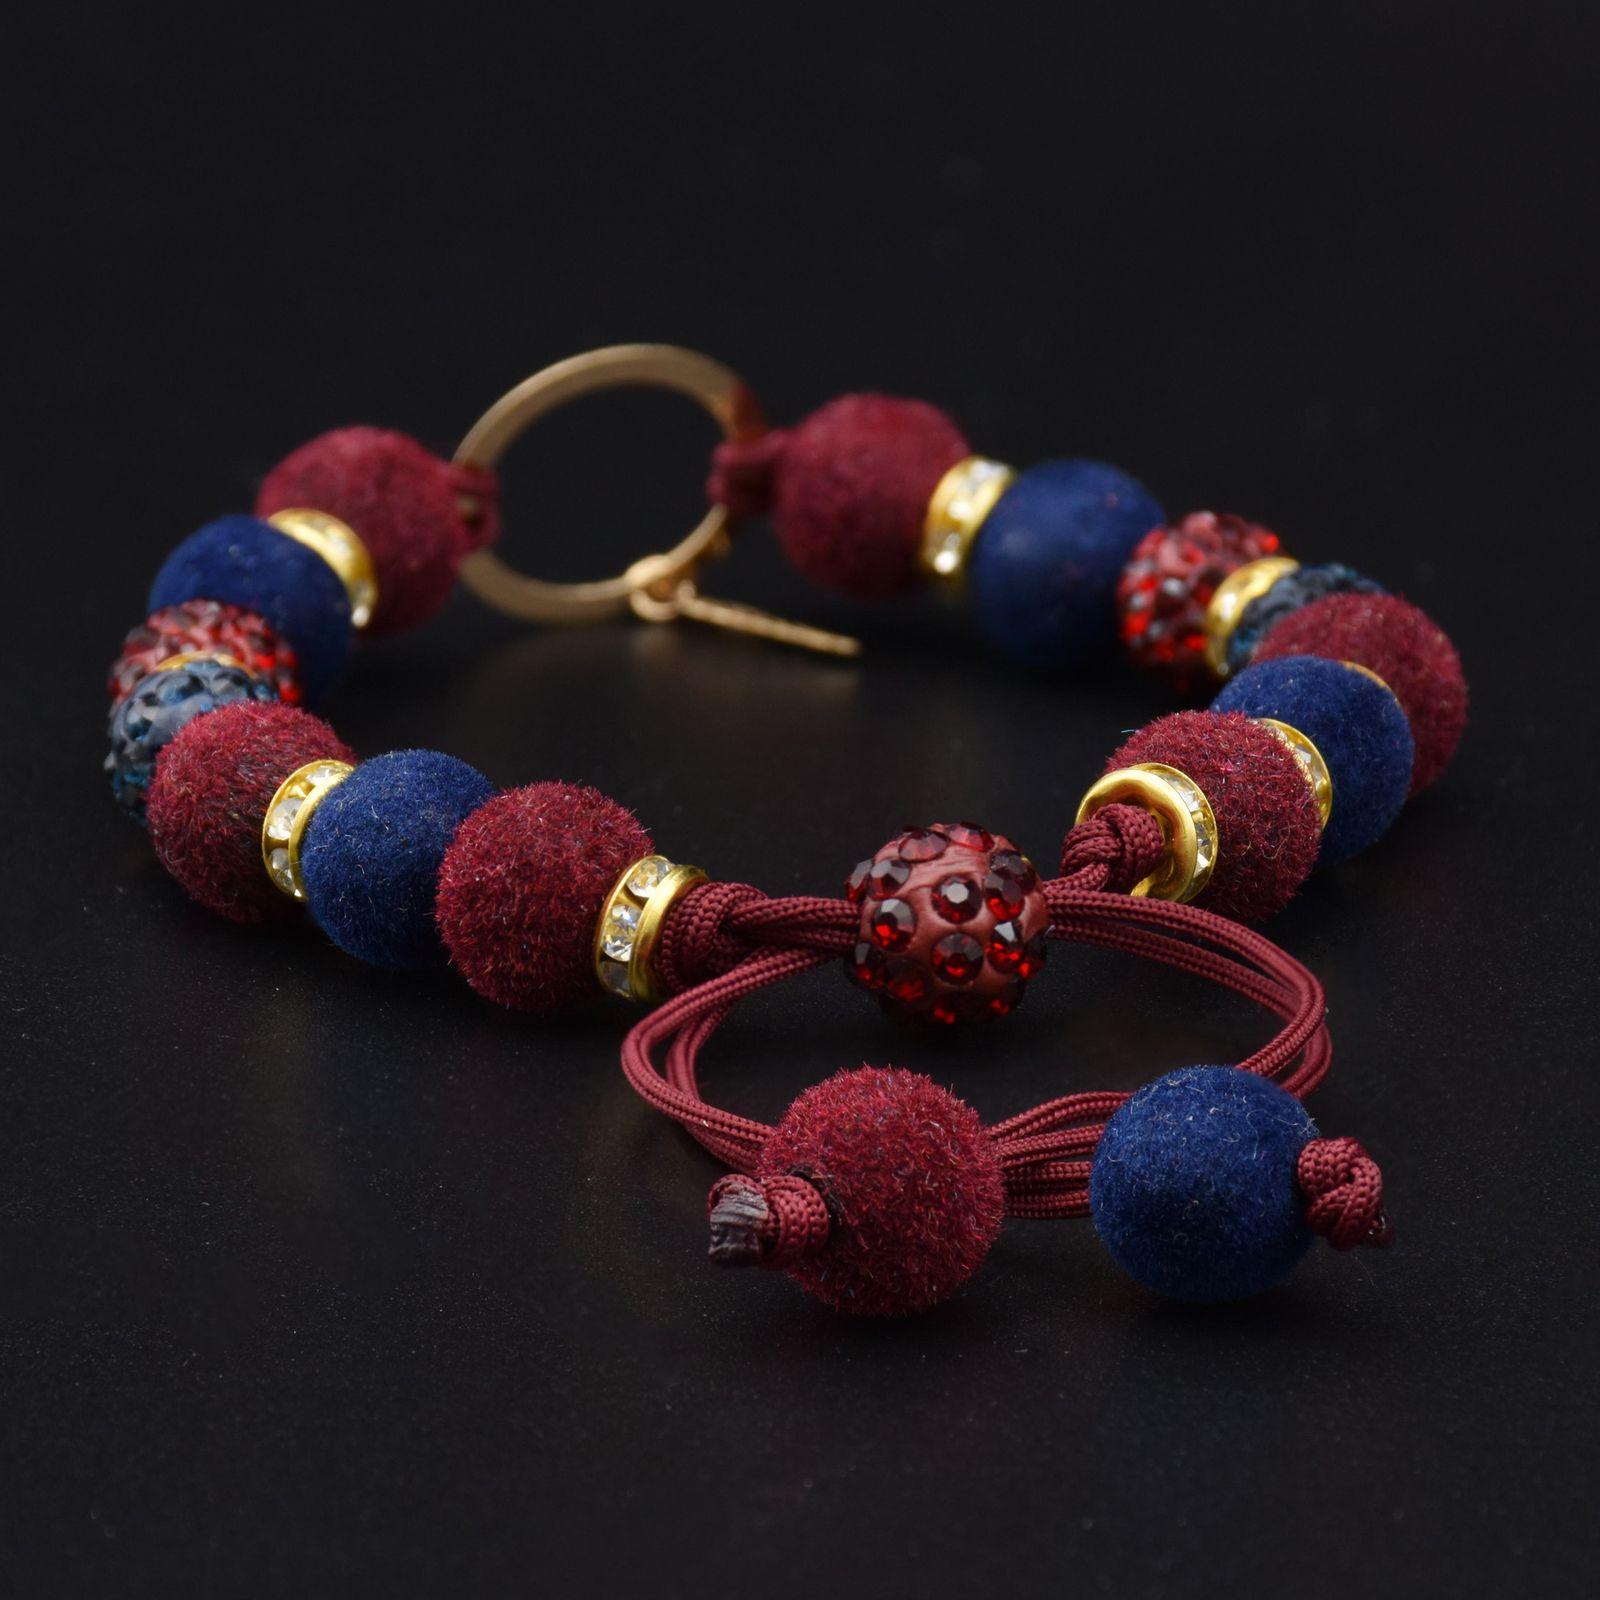 دستبند طلا 18 عیار زنانه آمانژ طرح بال کد 946D8899 -  - 3